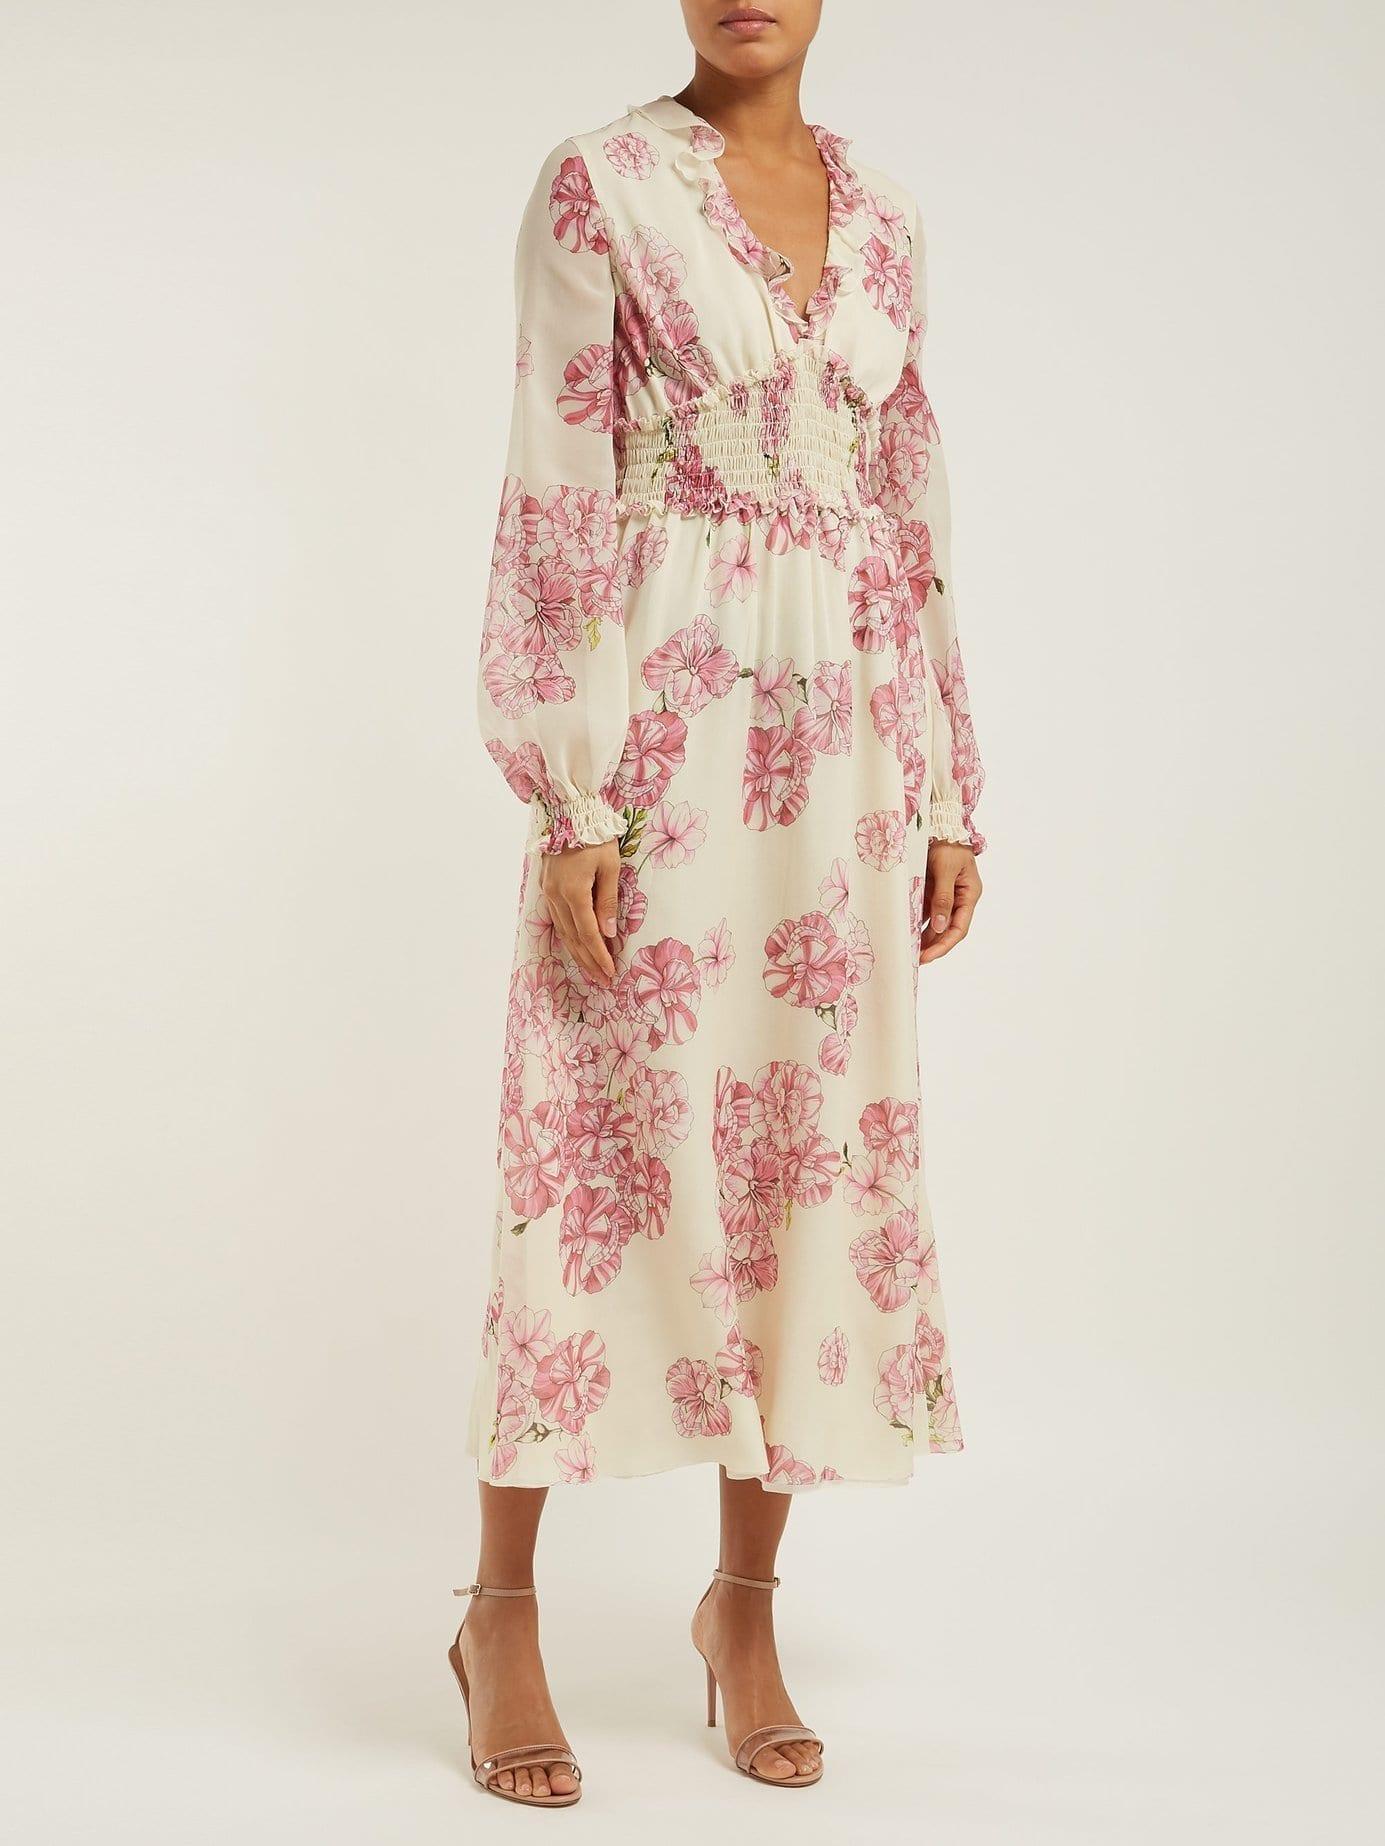 61982ff39427b GIAMBATTISTA VALLI Peony Print Silk Chiffon Midi Ivory Dress - We ...